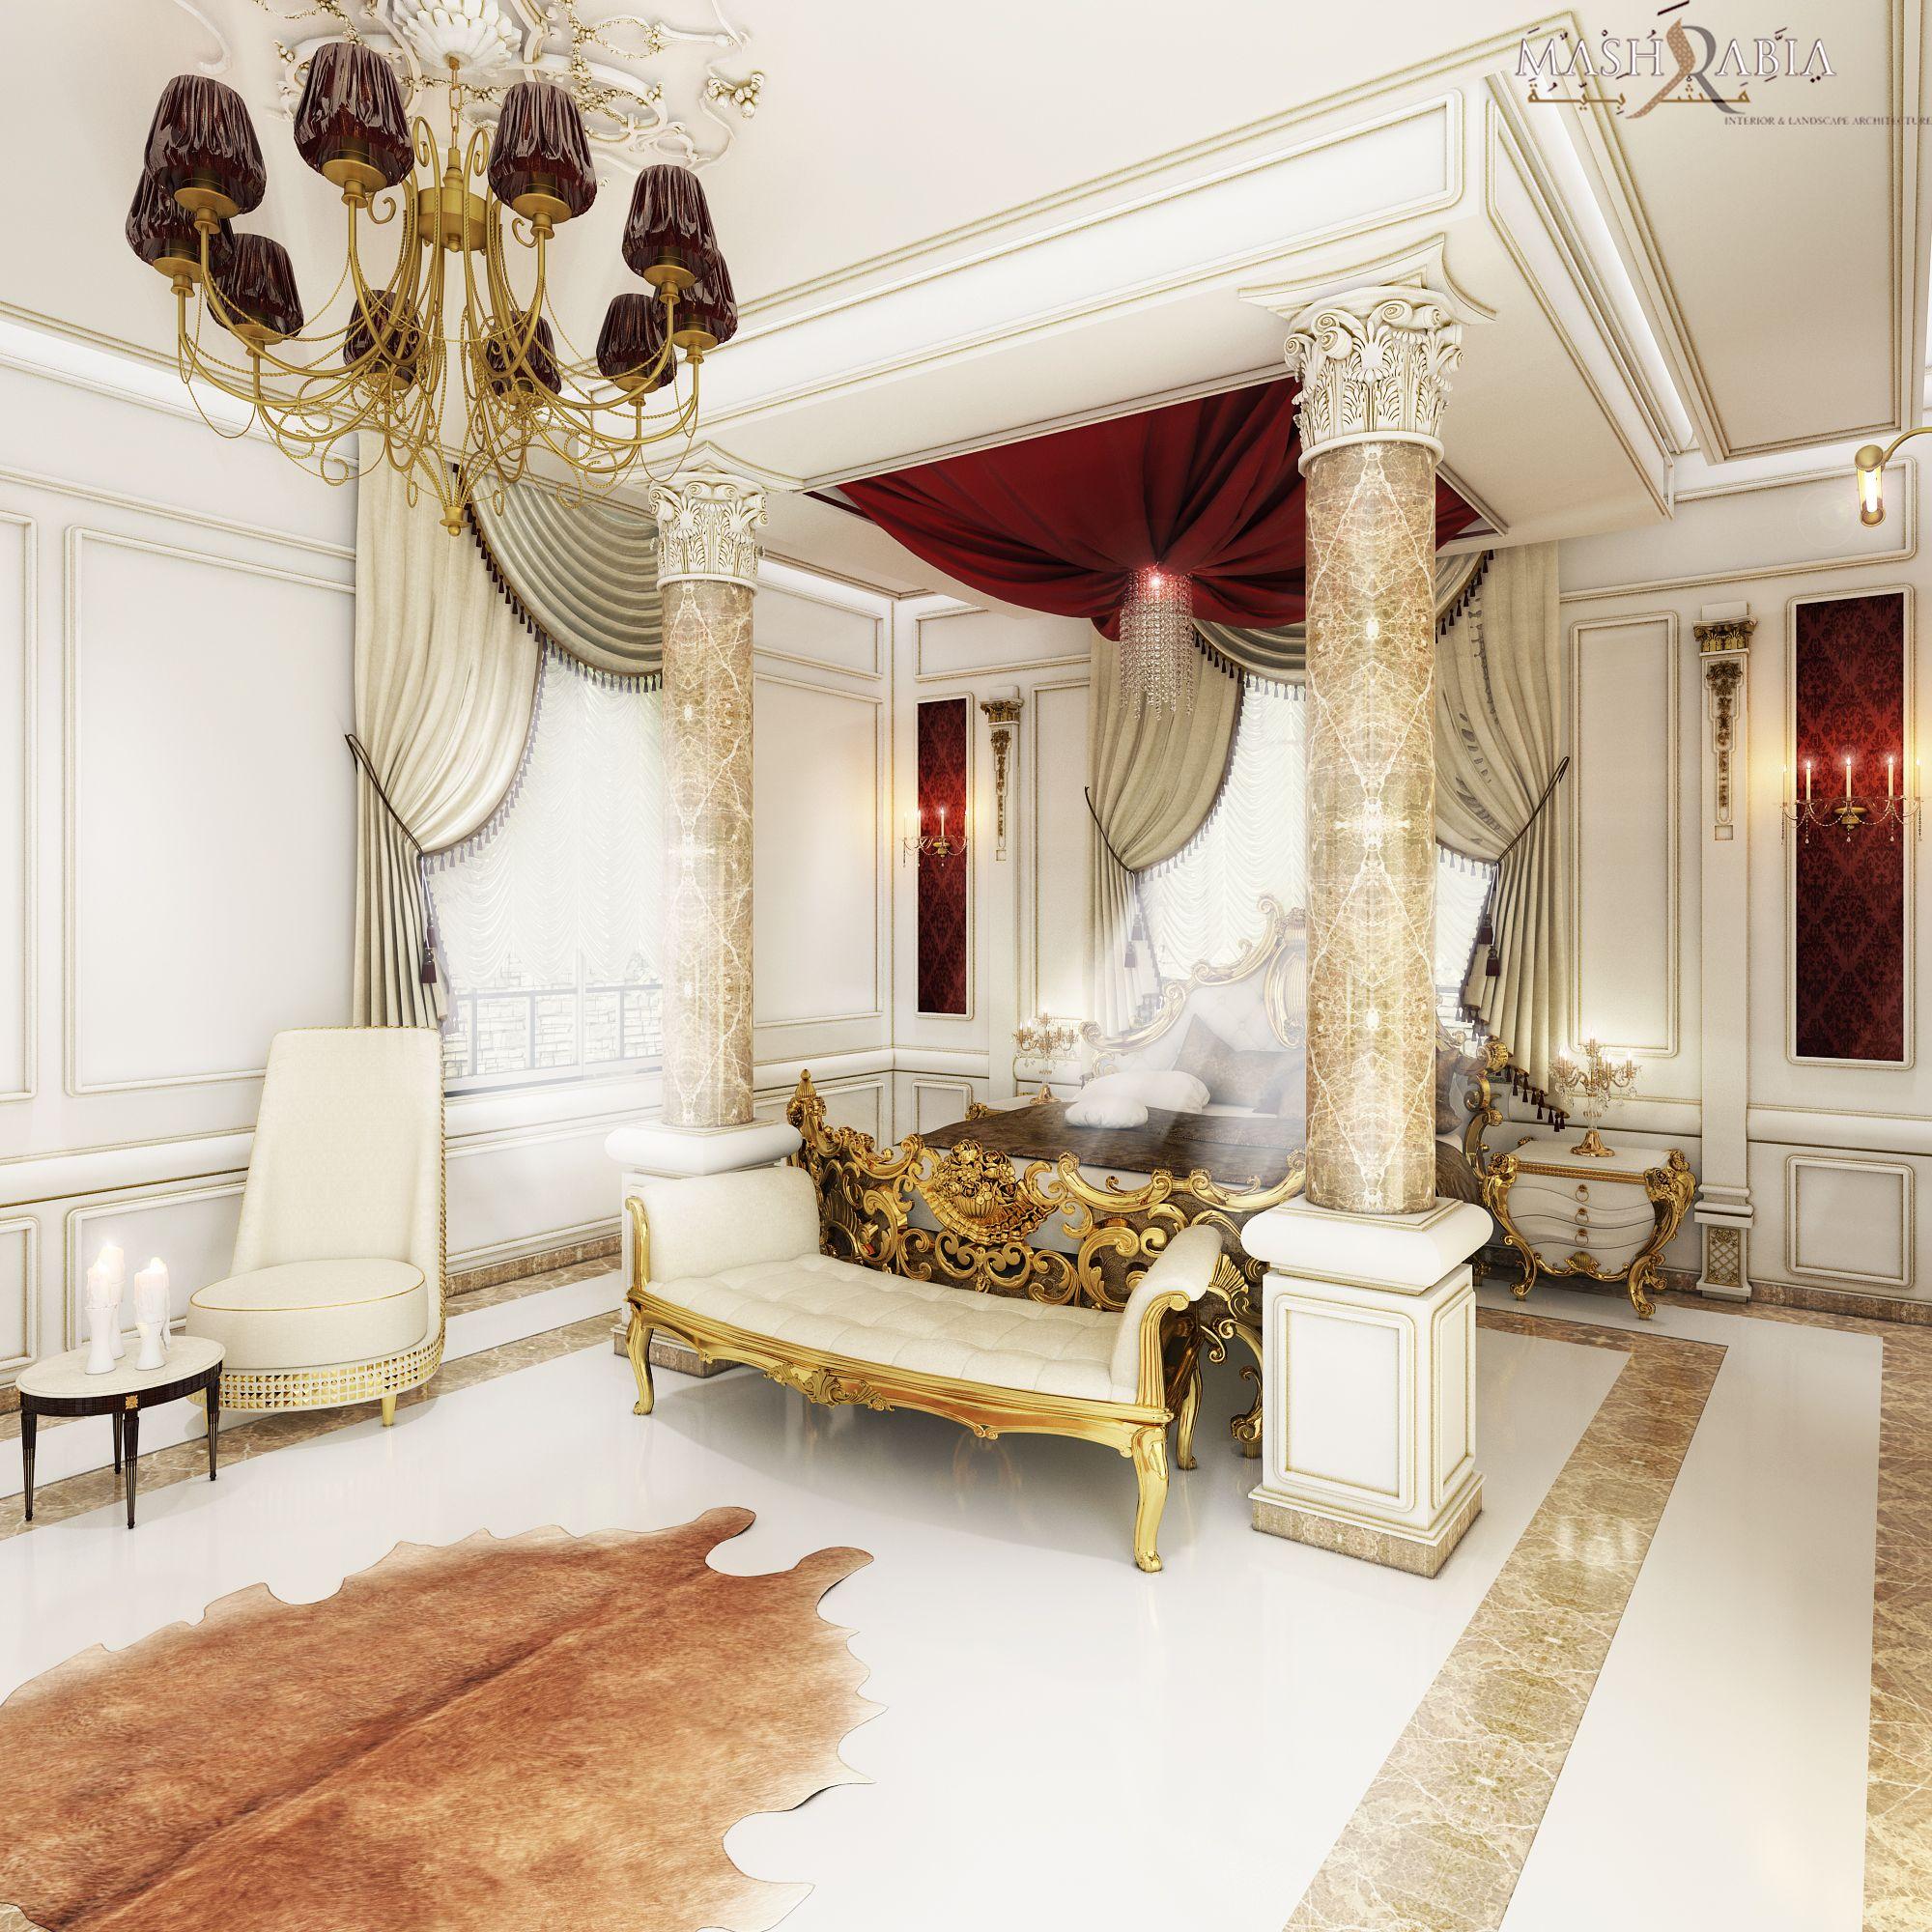 Royal Bedroom #Royal #Bedroom #Luxury #Palace #Classic | KSA Palace ...